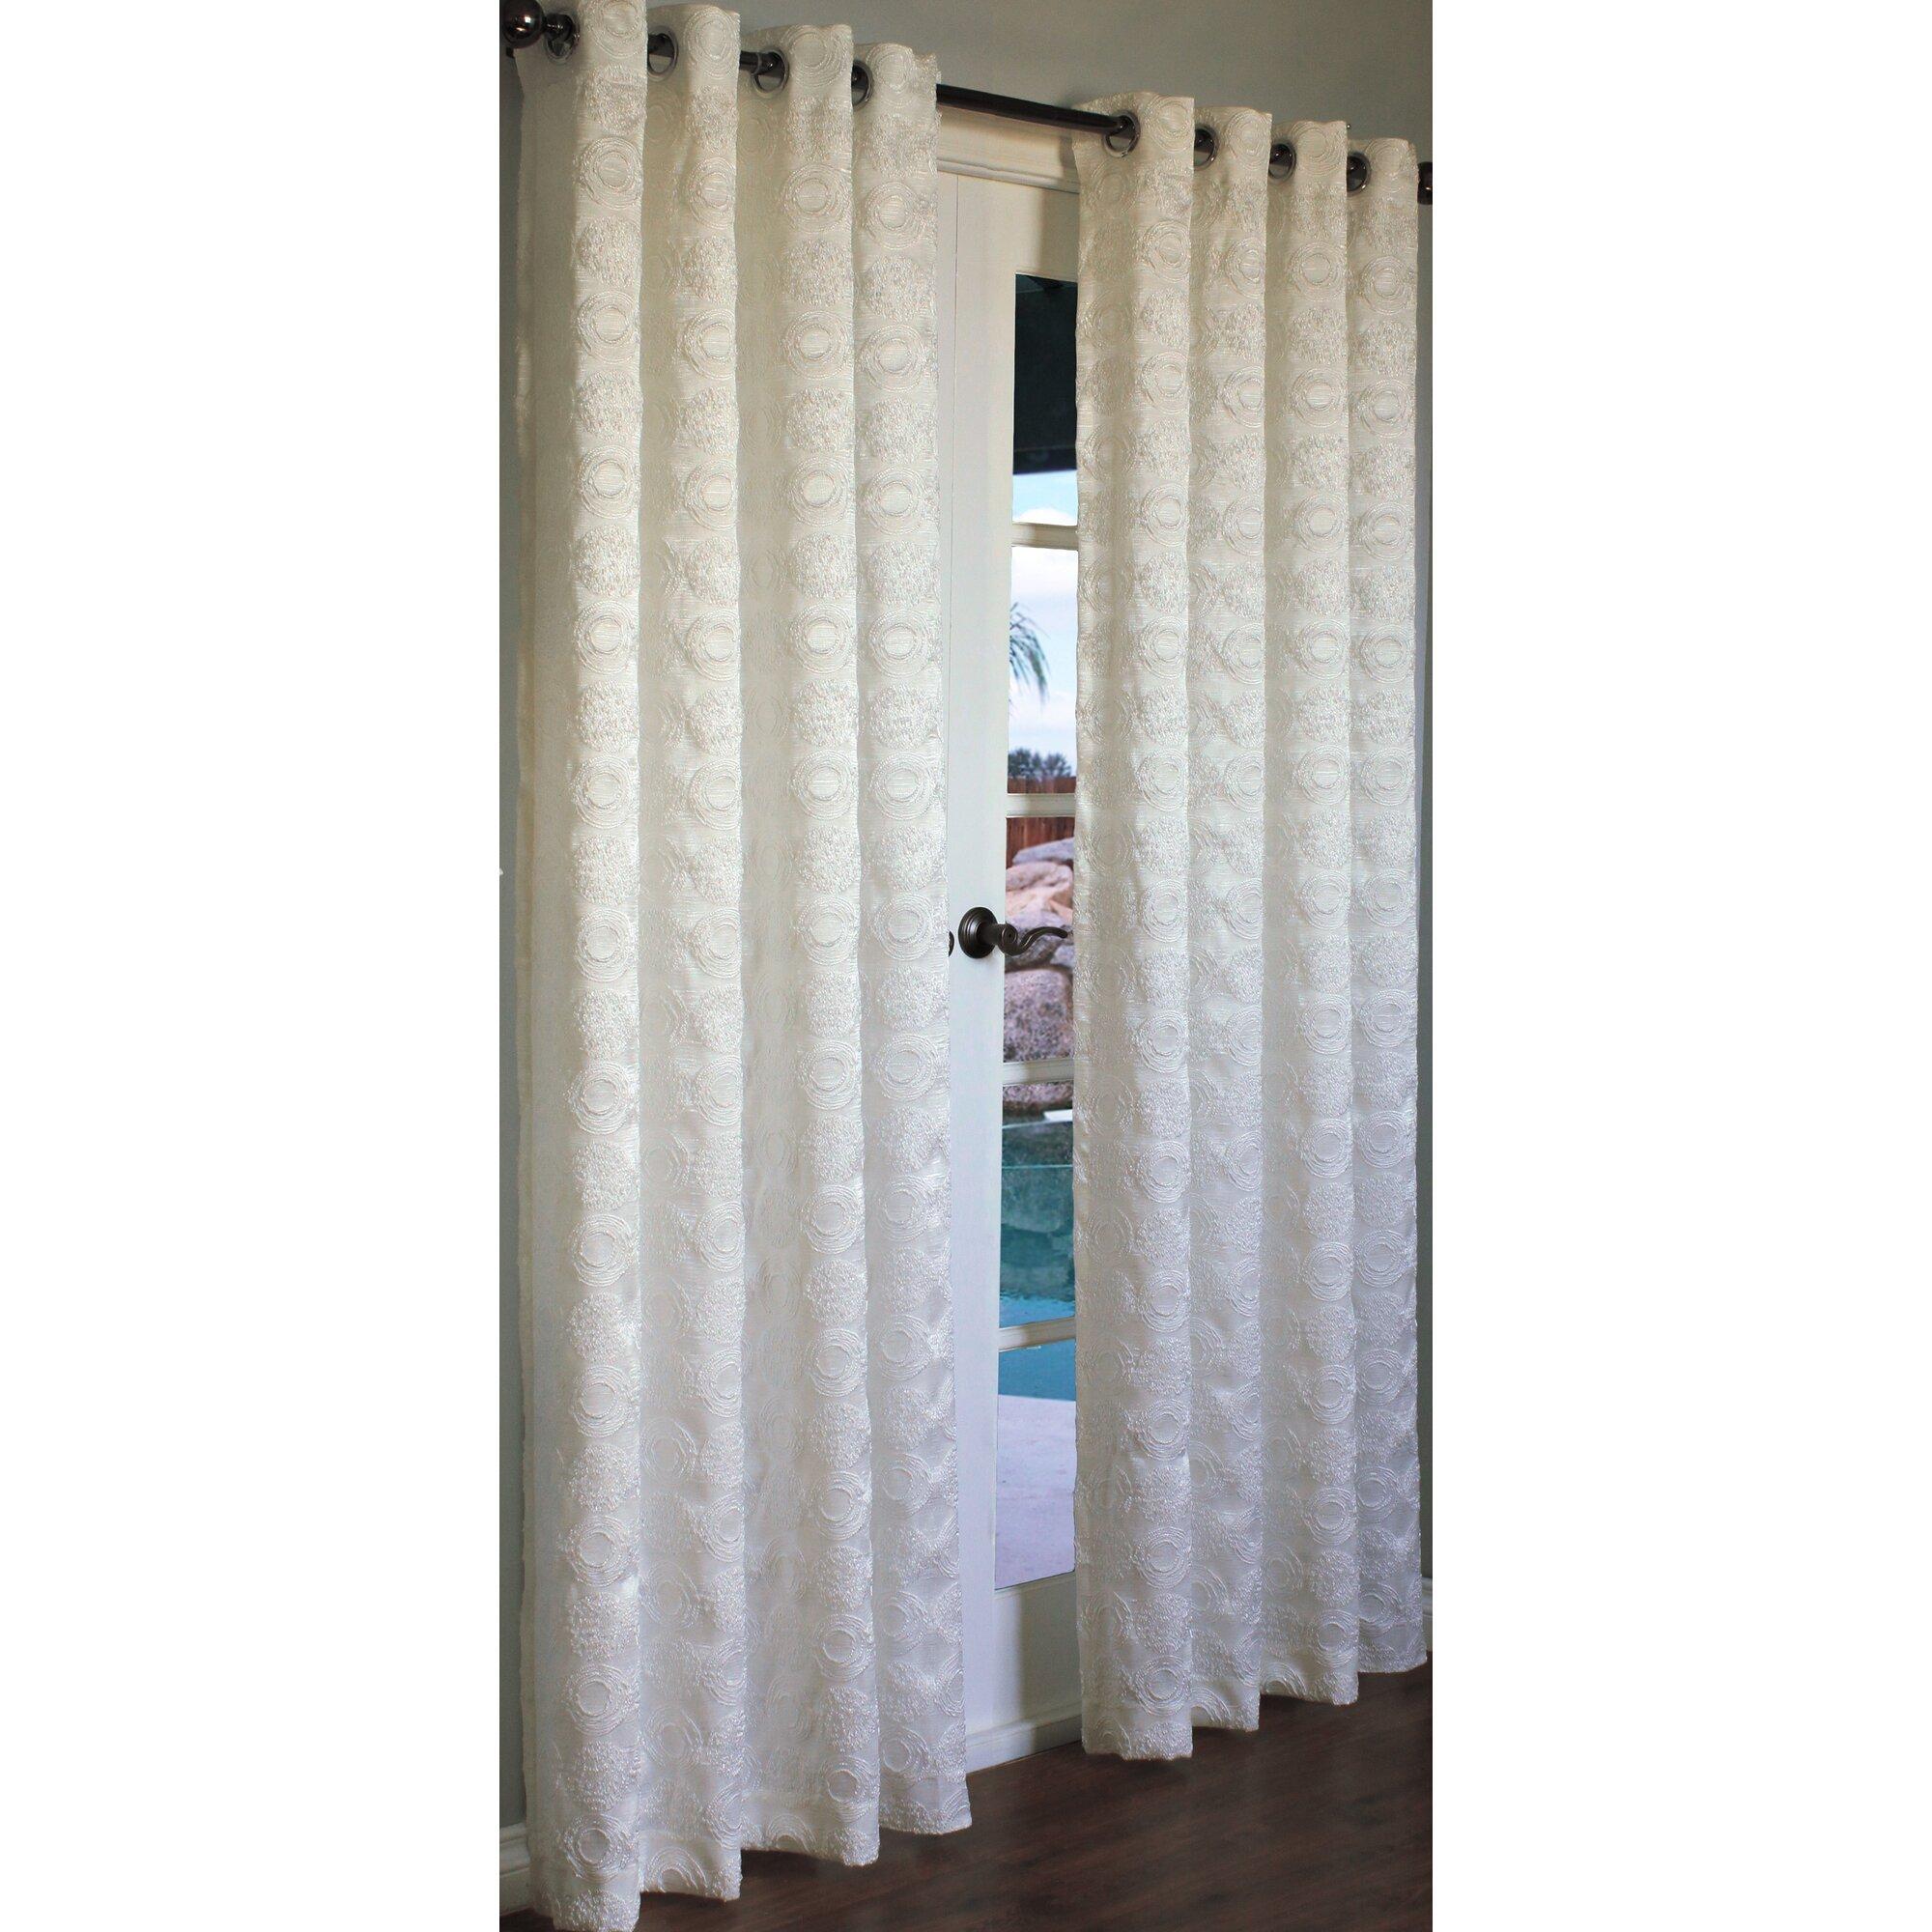 Brayden Studio Arlon Geometric Semi Sheer Curtain Panels